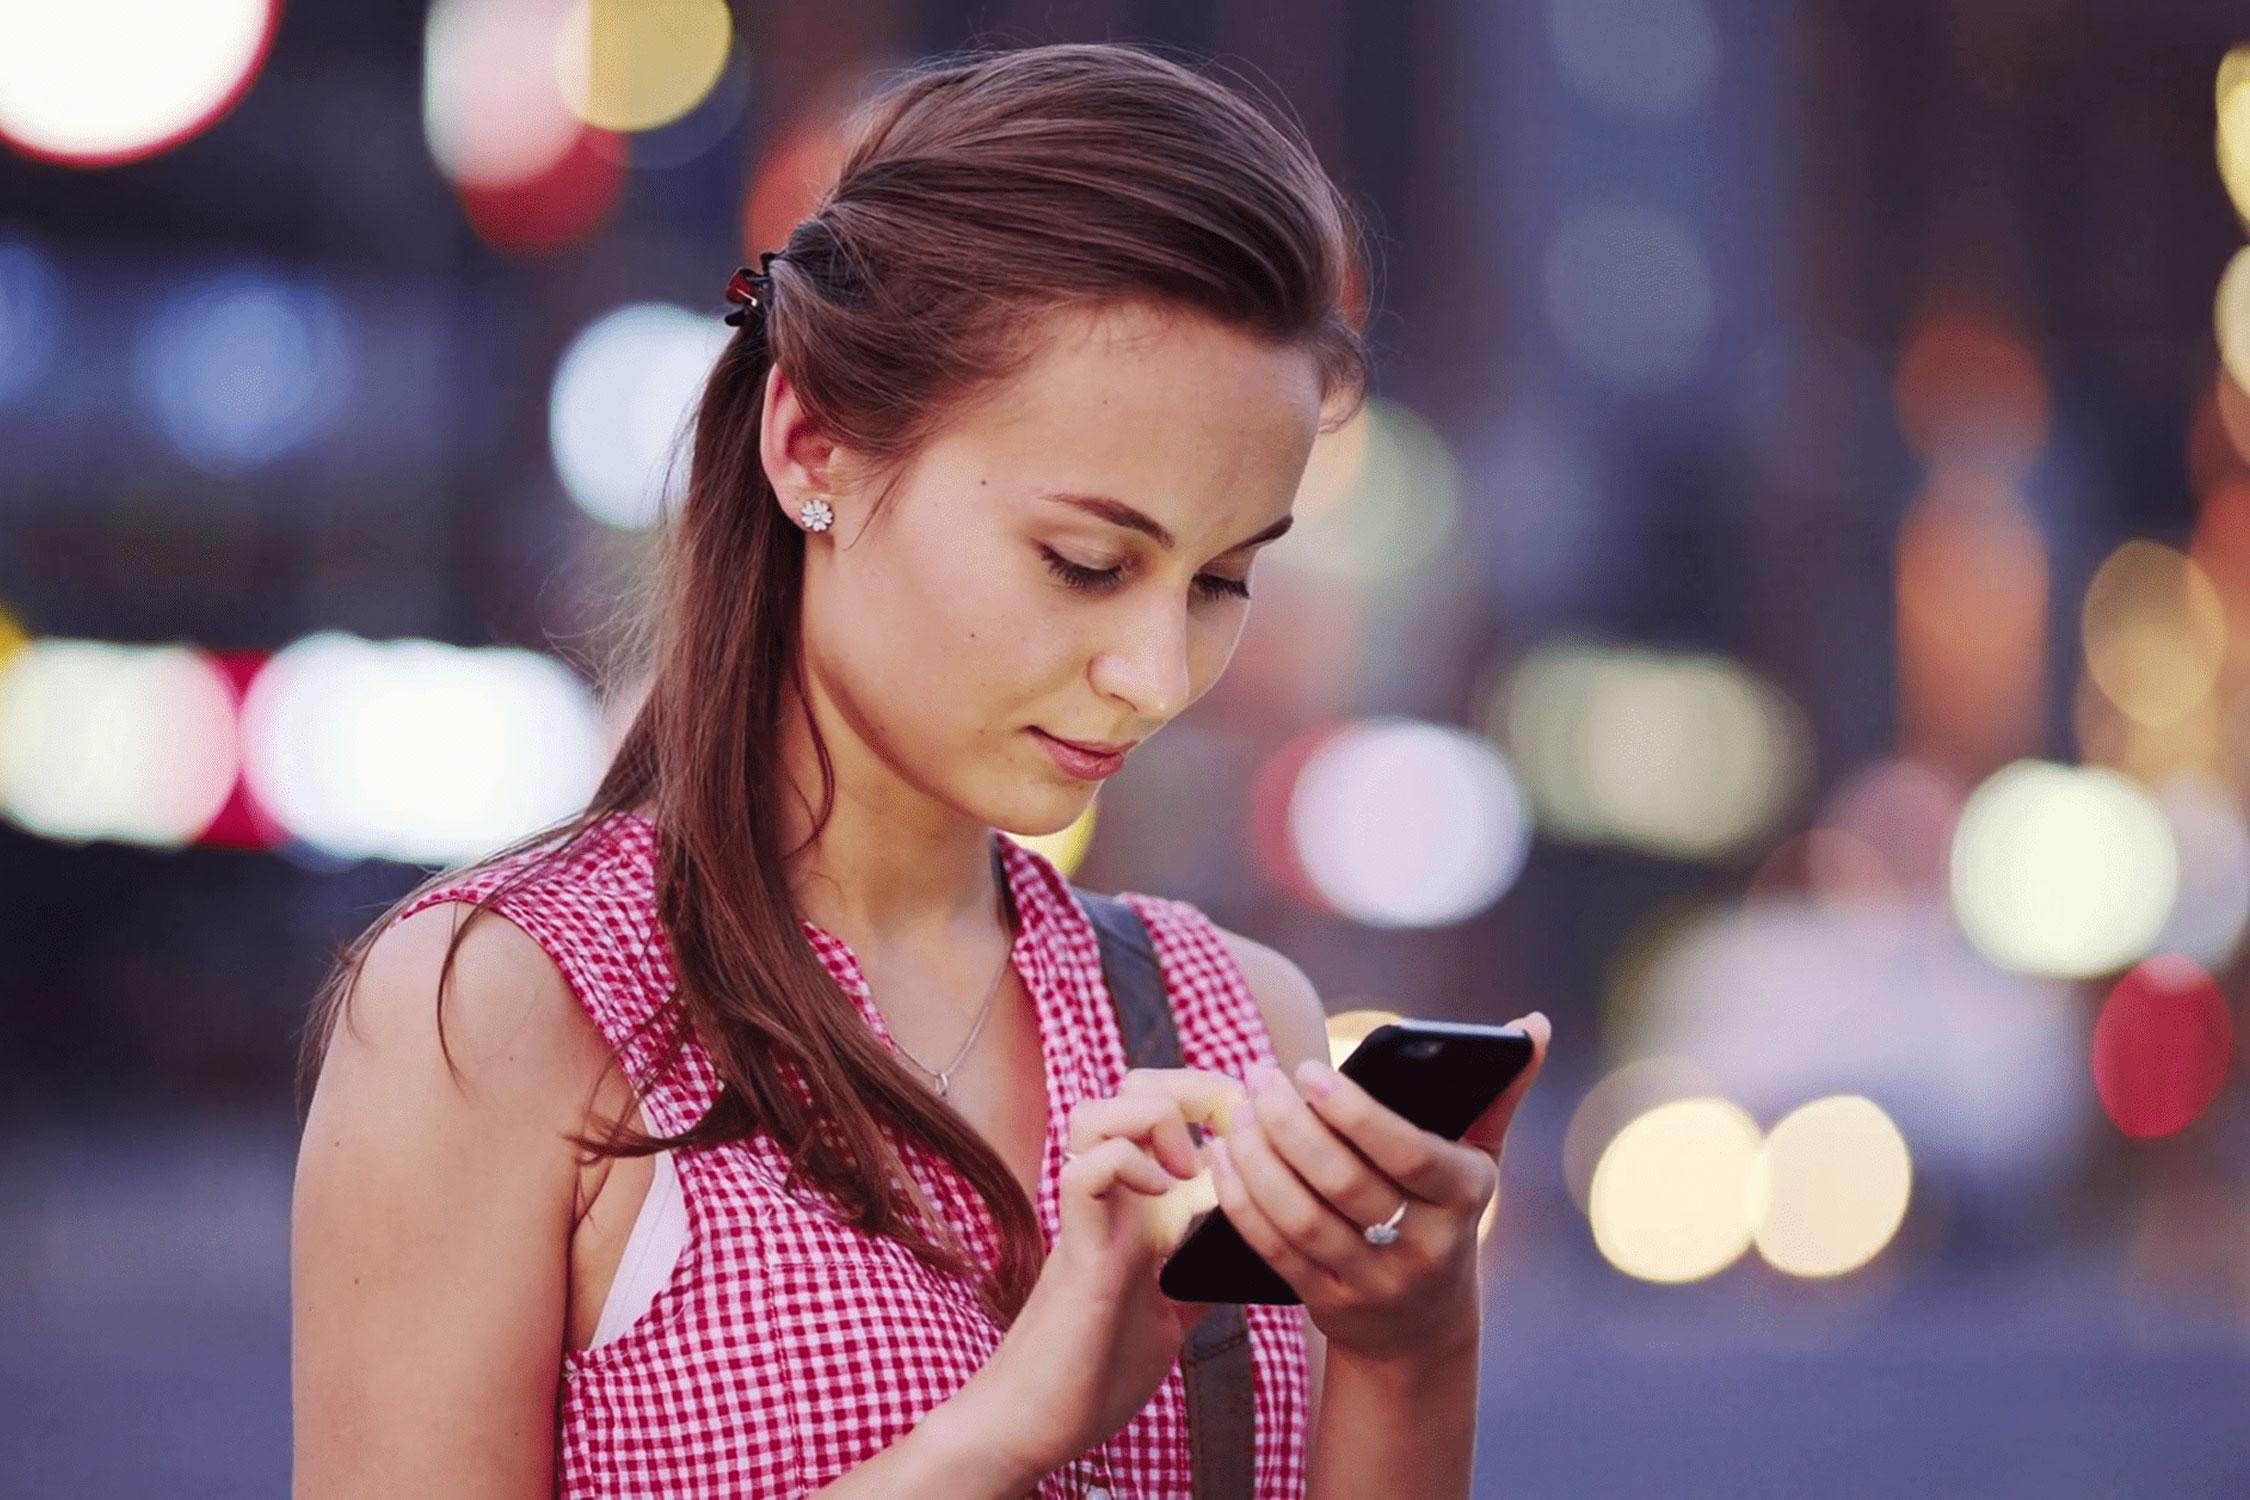 Las Apps le dan ventaja competitiva a su empresa